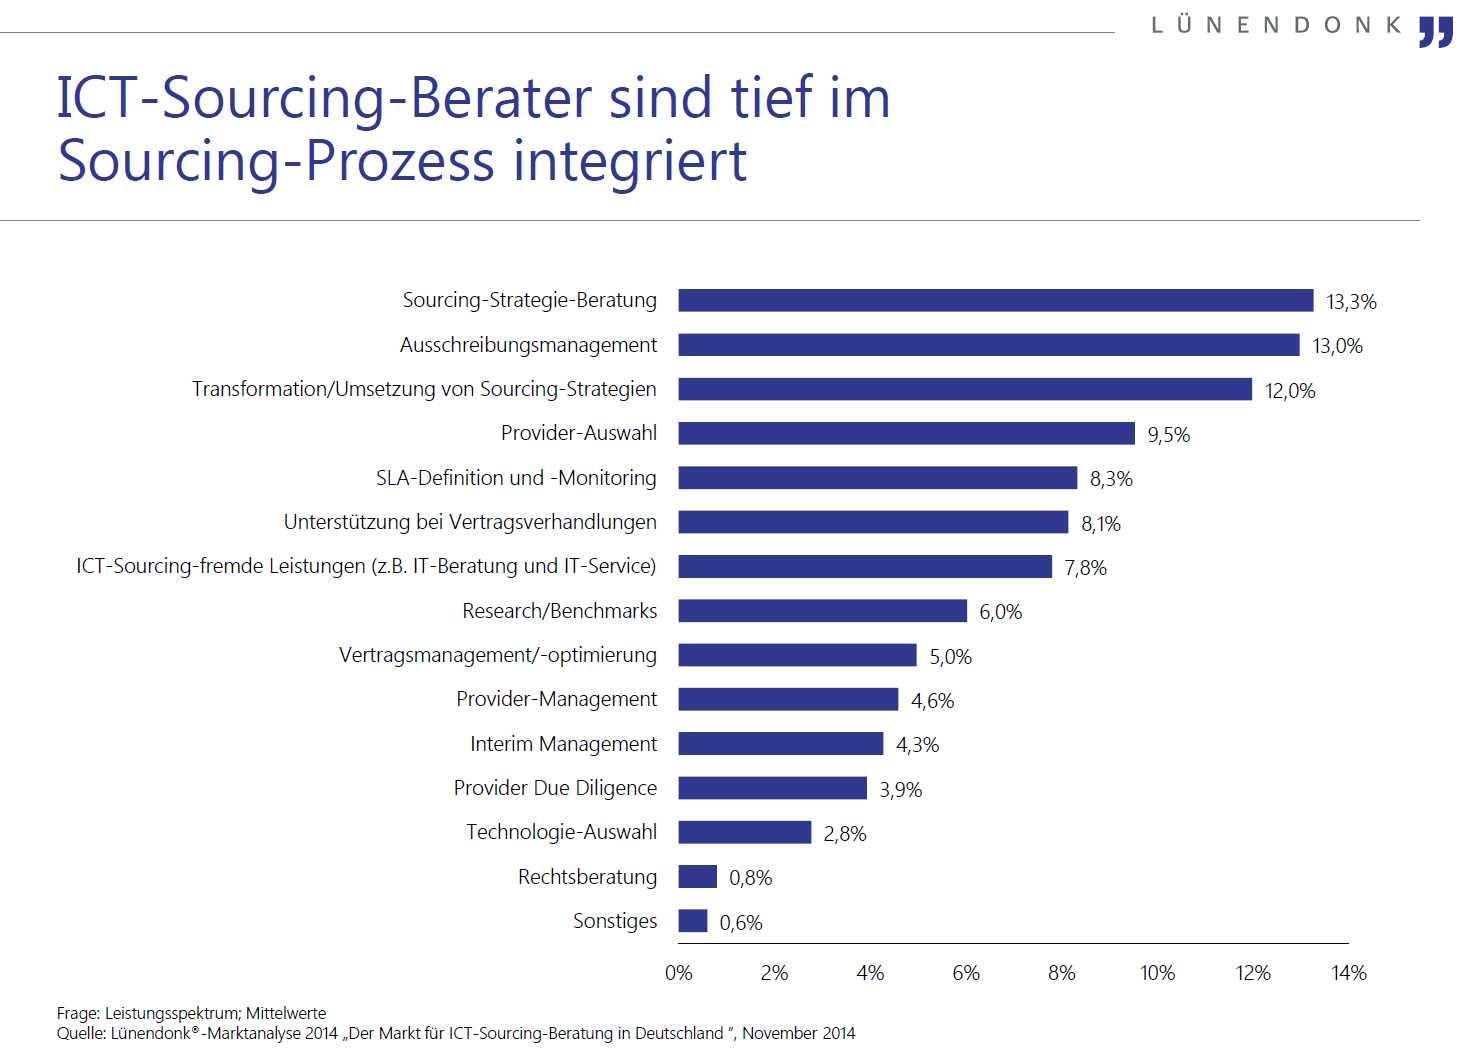 Studie Marktanalyse ICT-Sourcing-Beratung Lünendonk